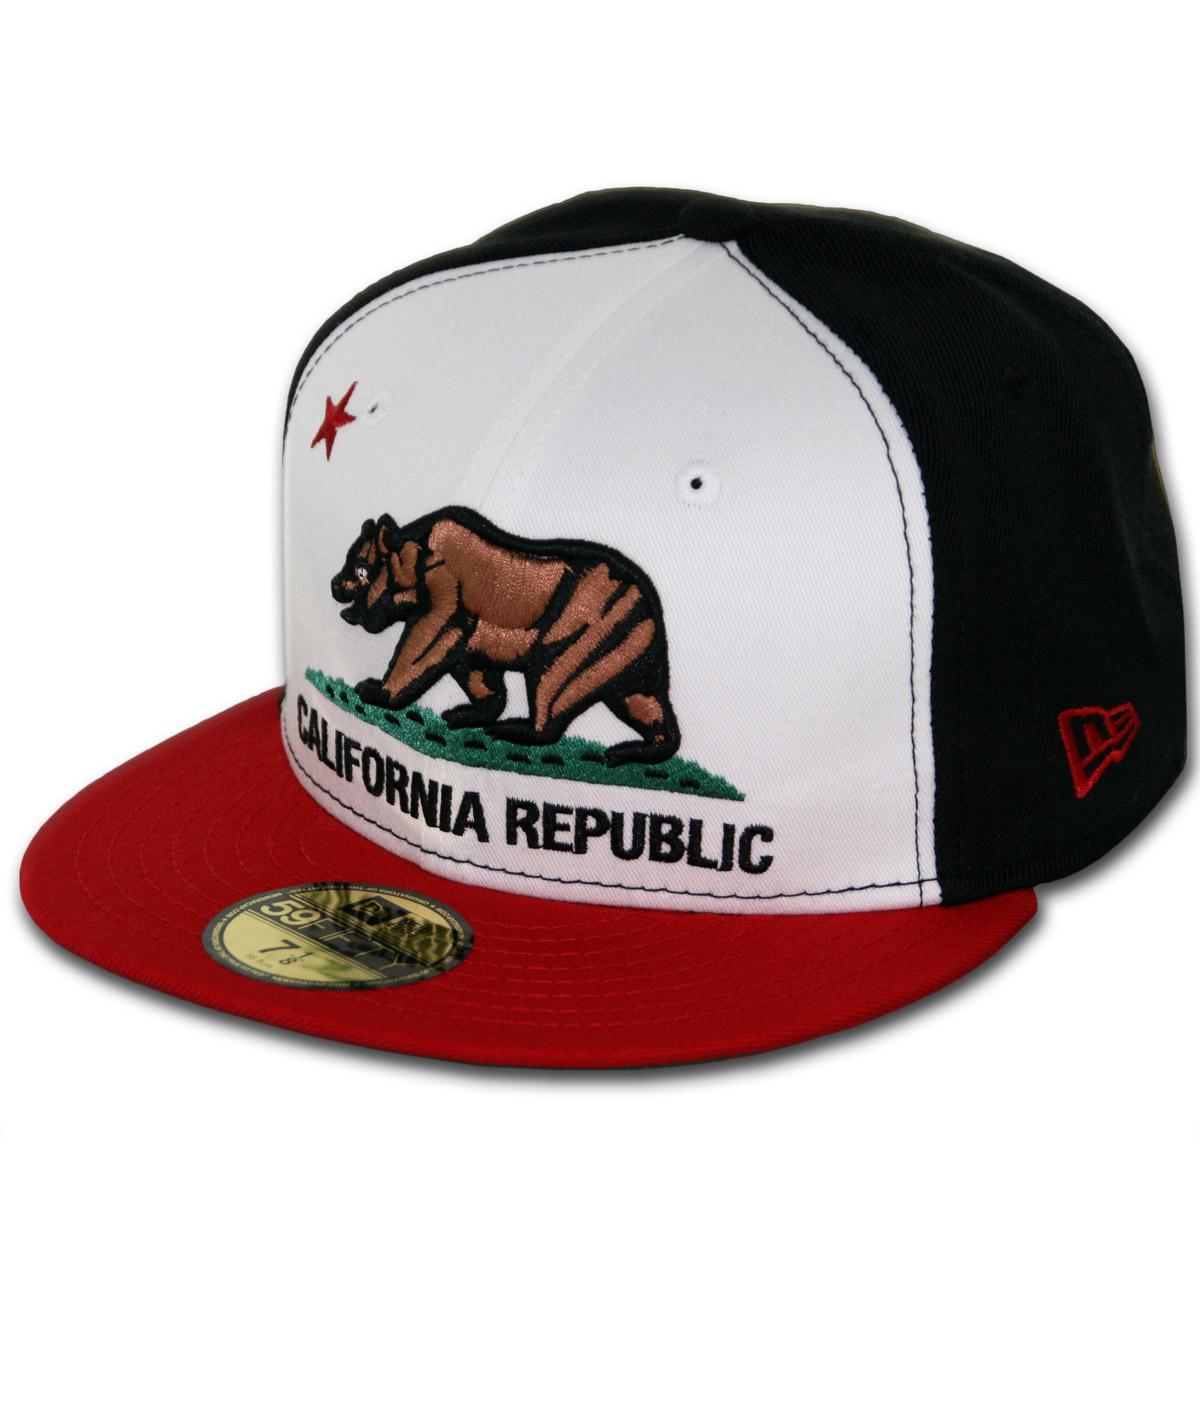 California Republic Logo California republic 2 tone 1200x1415